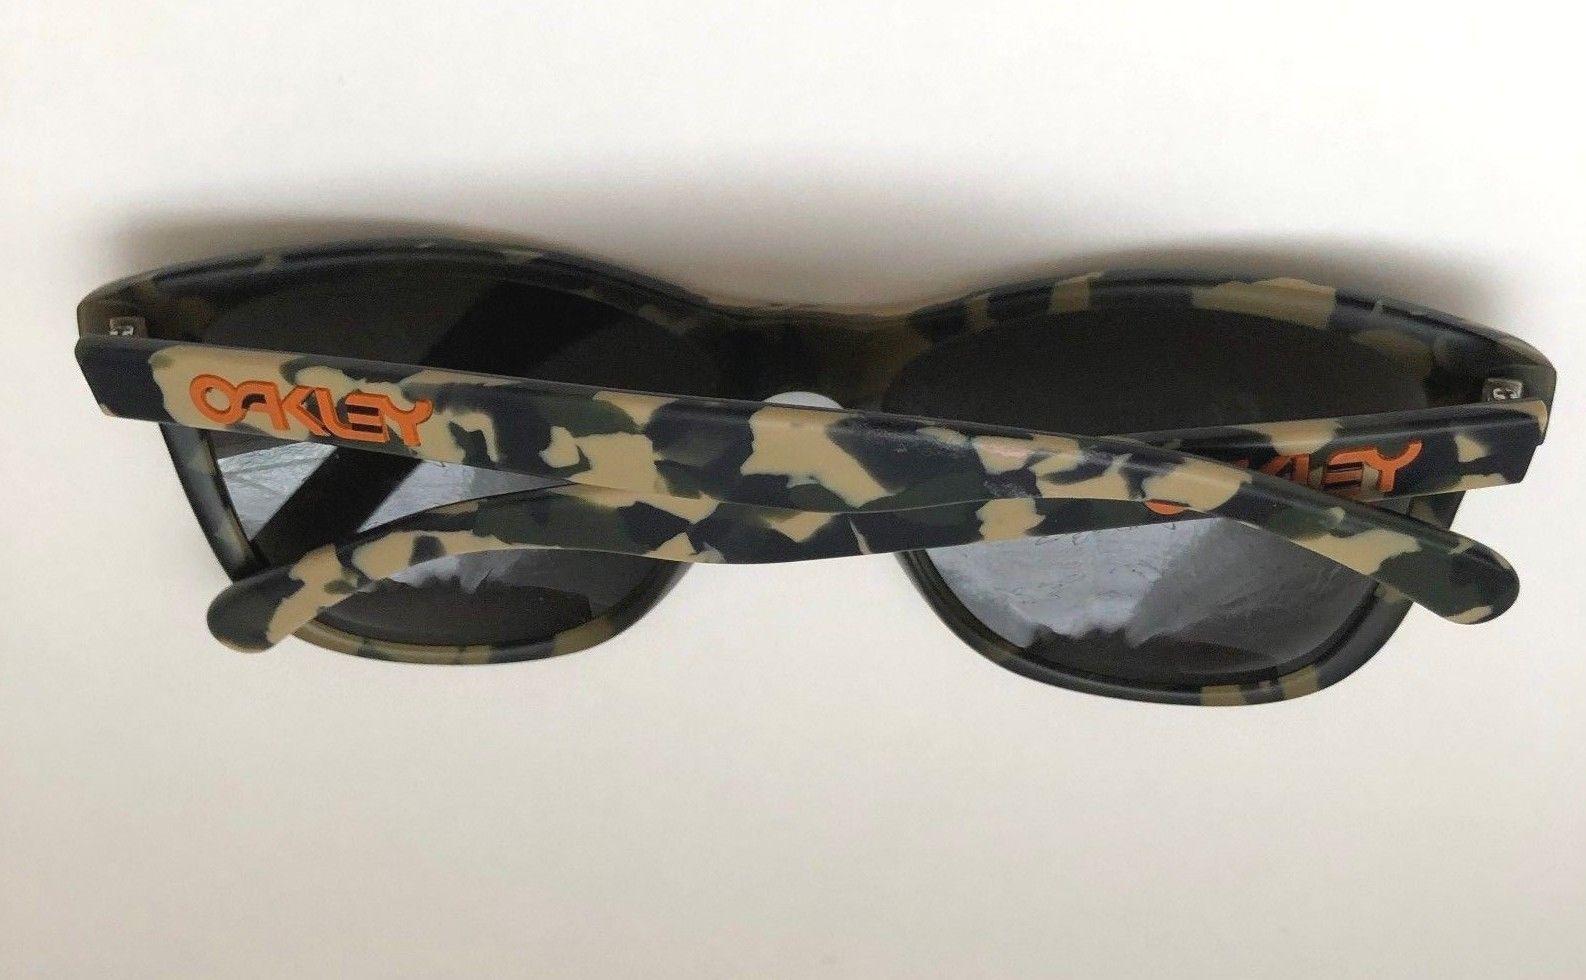 1162c502422 ... Oakley Frogskins LX Koston Matte Camo Green Dark Grey Sunglasses  Authentic Used ...